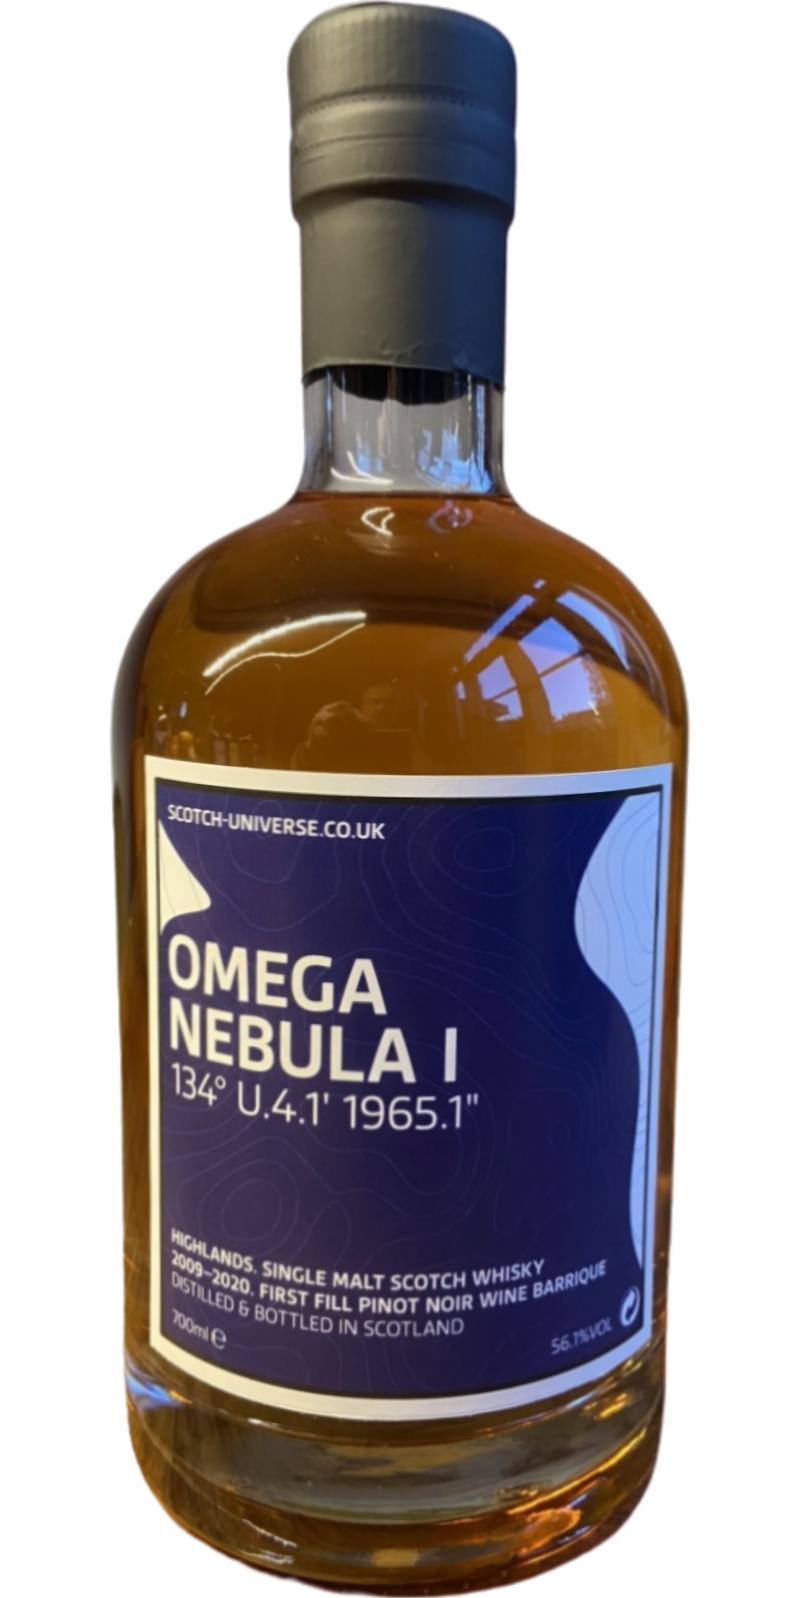 "Scotch Universe Omega Nebula I - 134° U.4.1' 1965.1"""